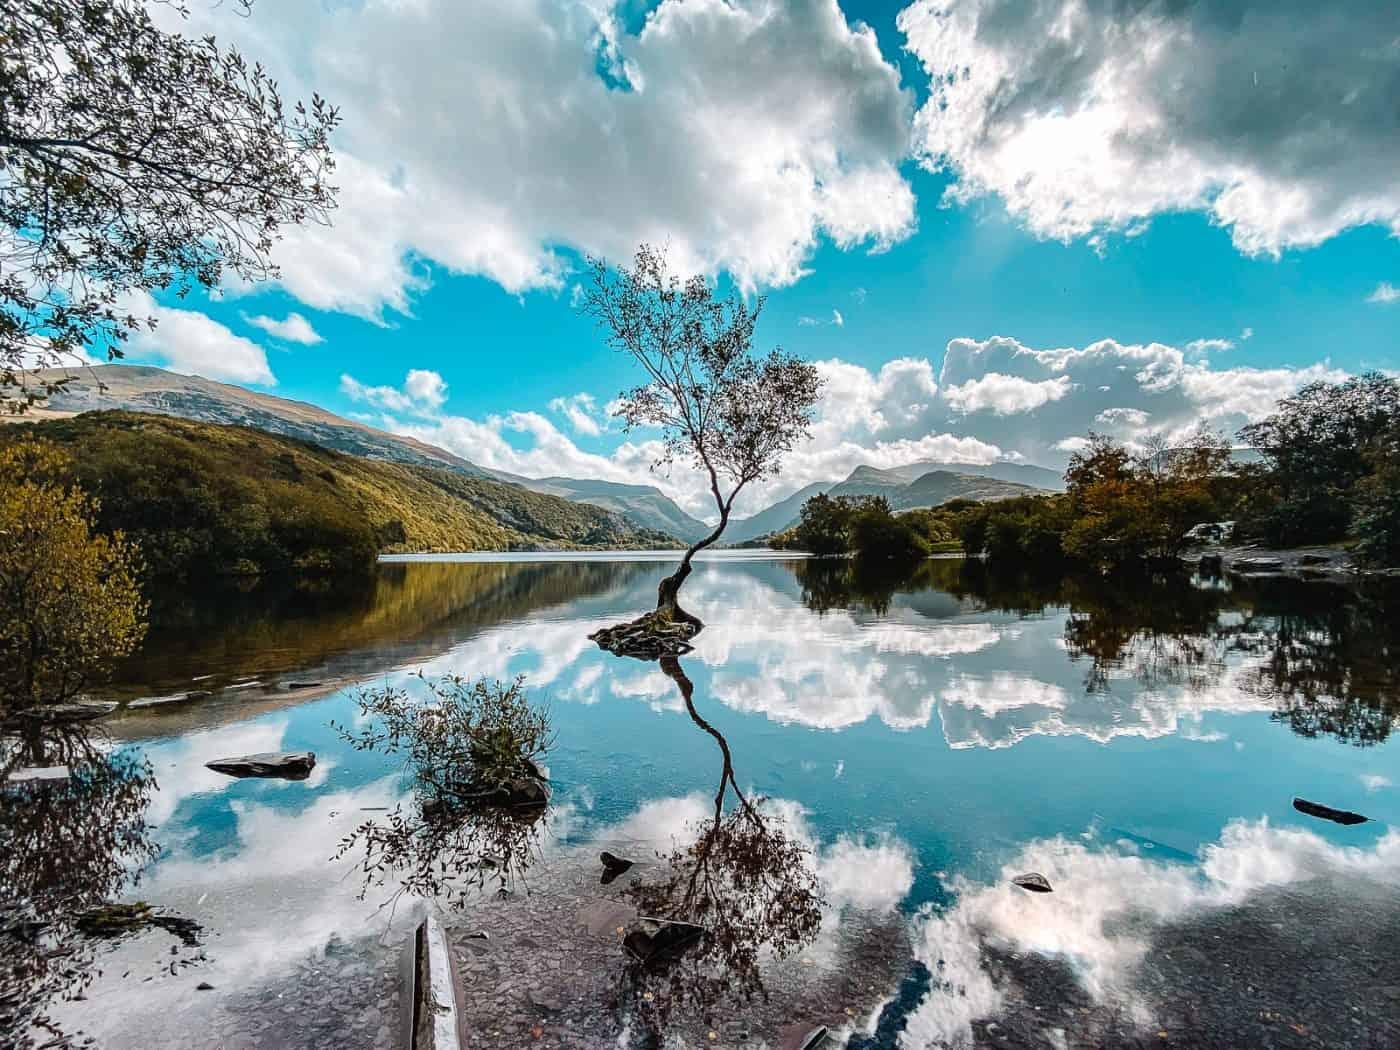 Lonely Tree Llanberis Location Llyn Padarn Snowdonia